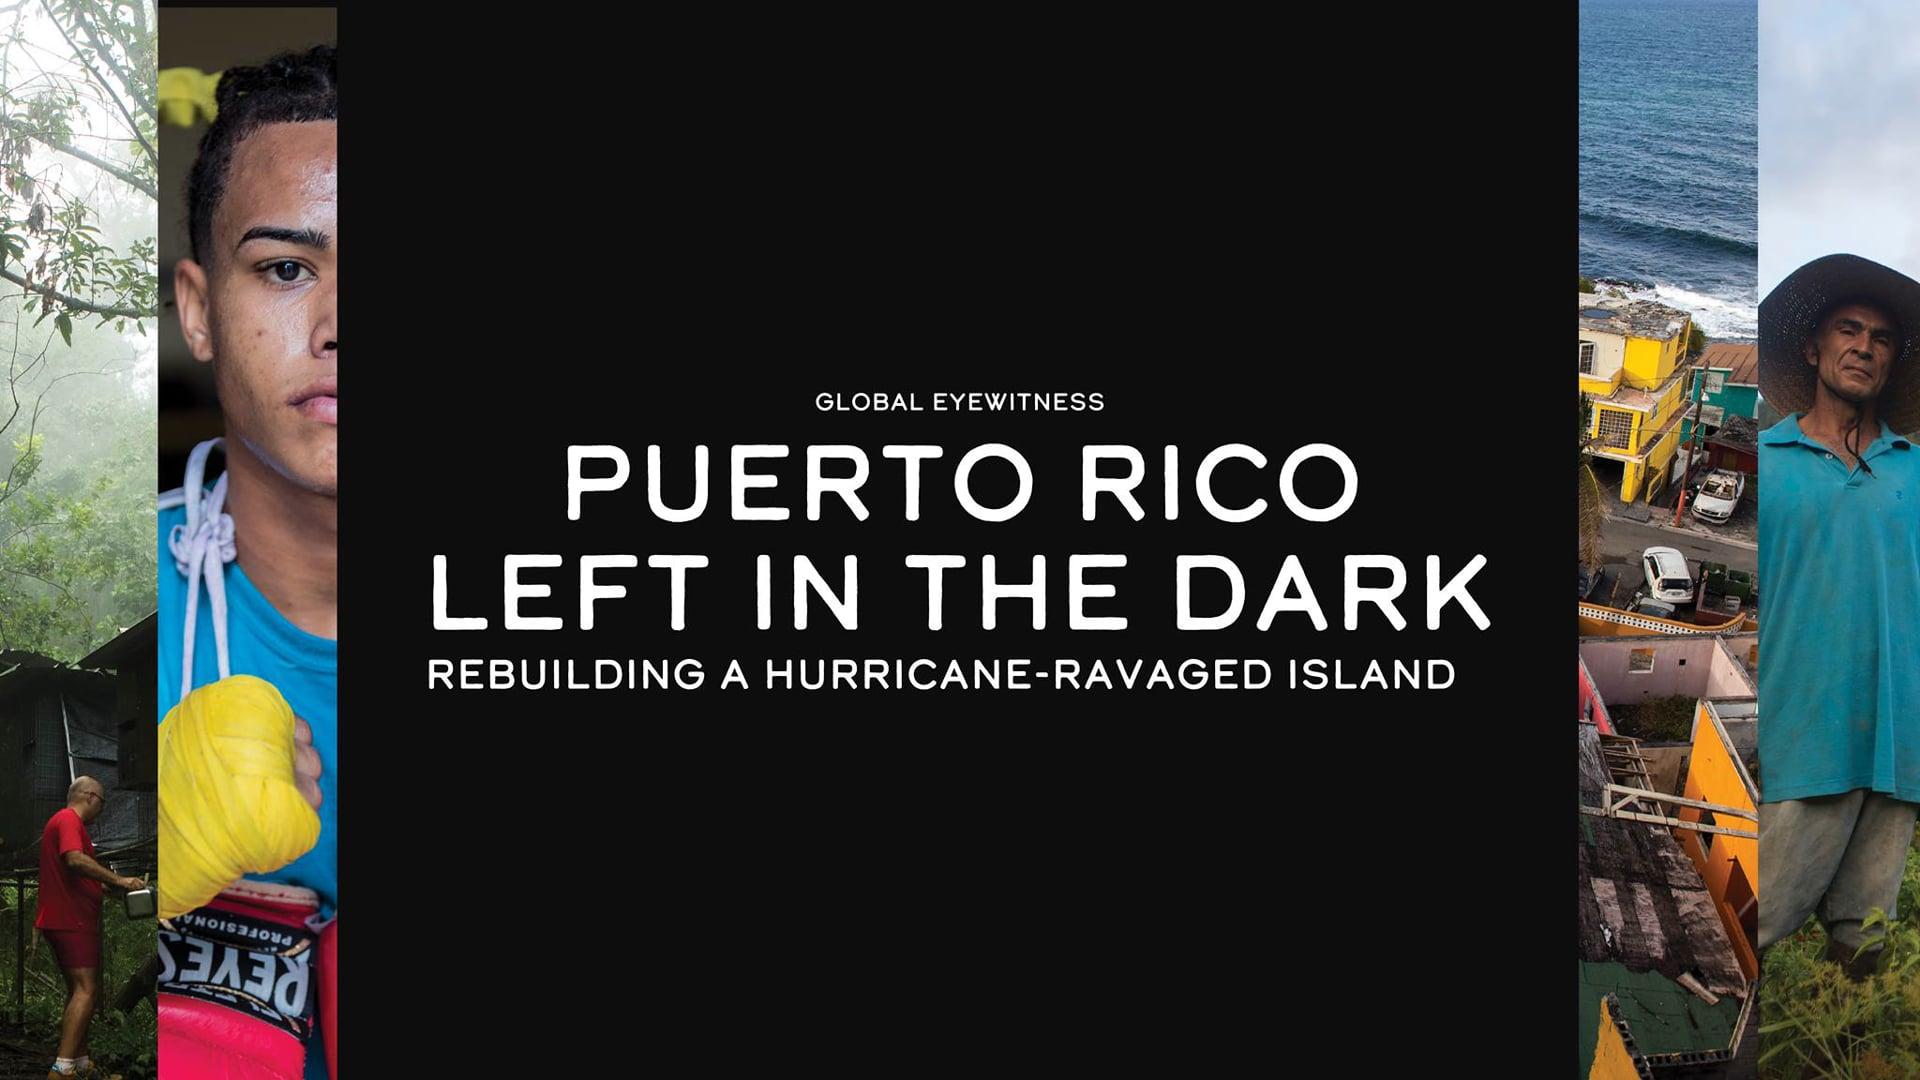 Global Eyewitness Puerto Rico Intro